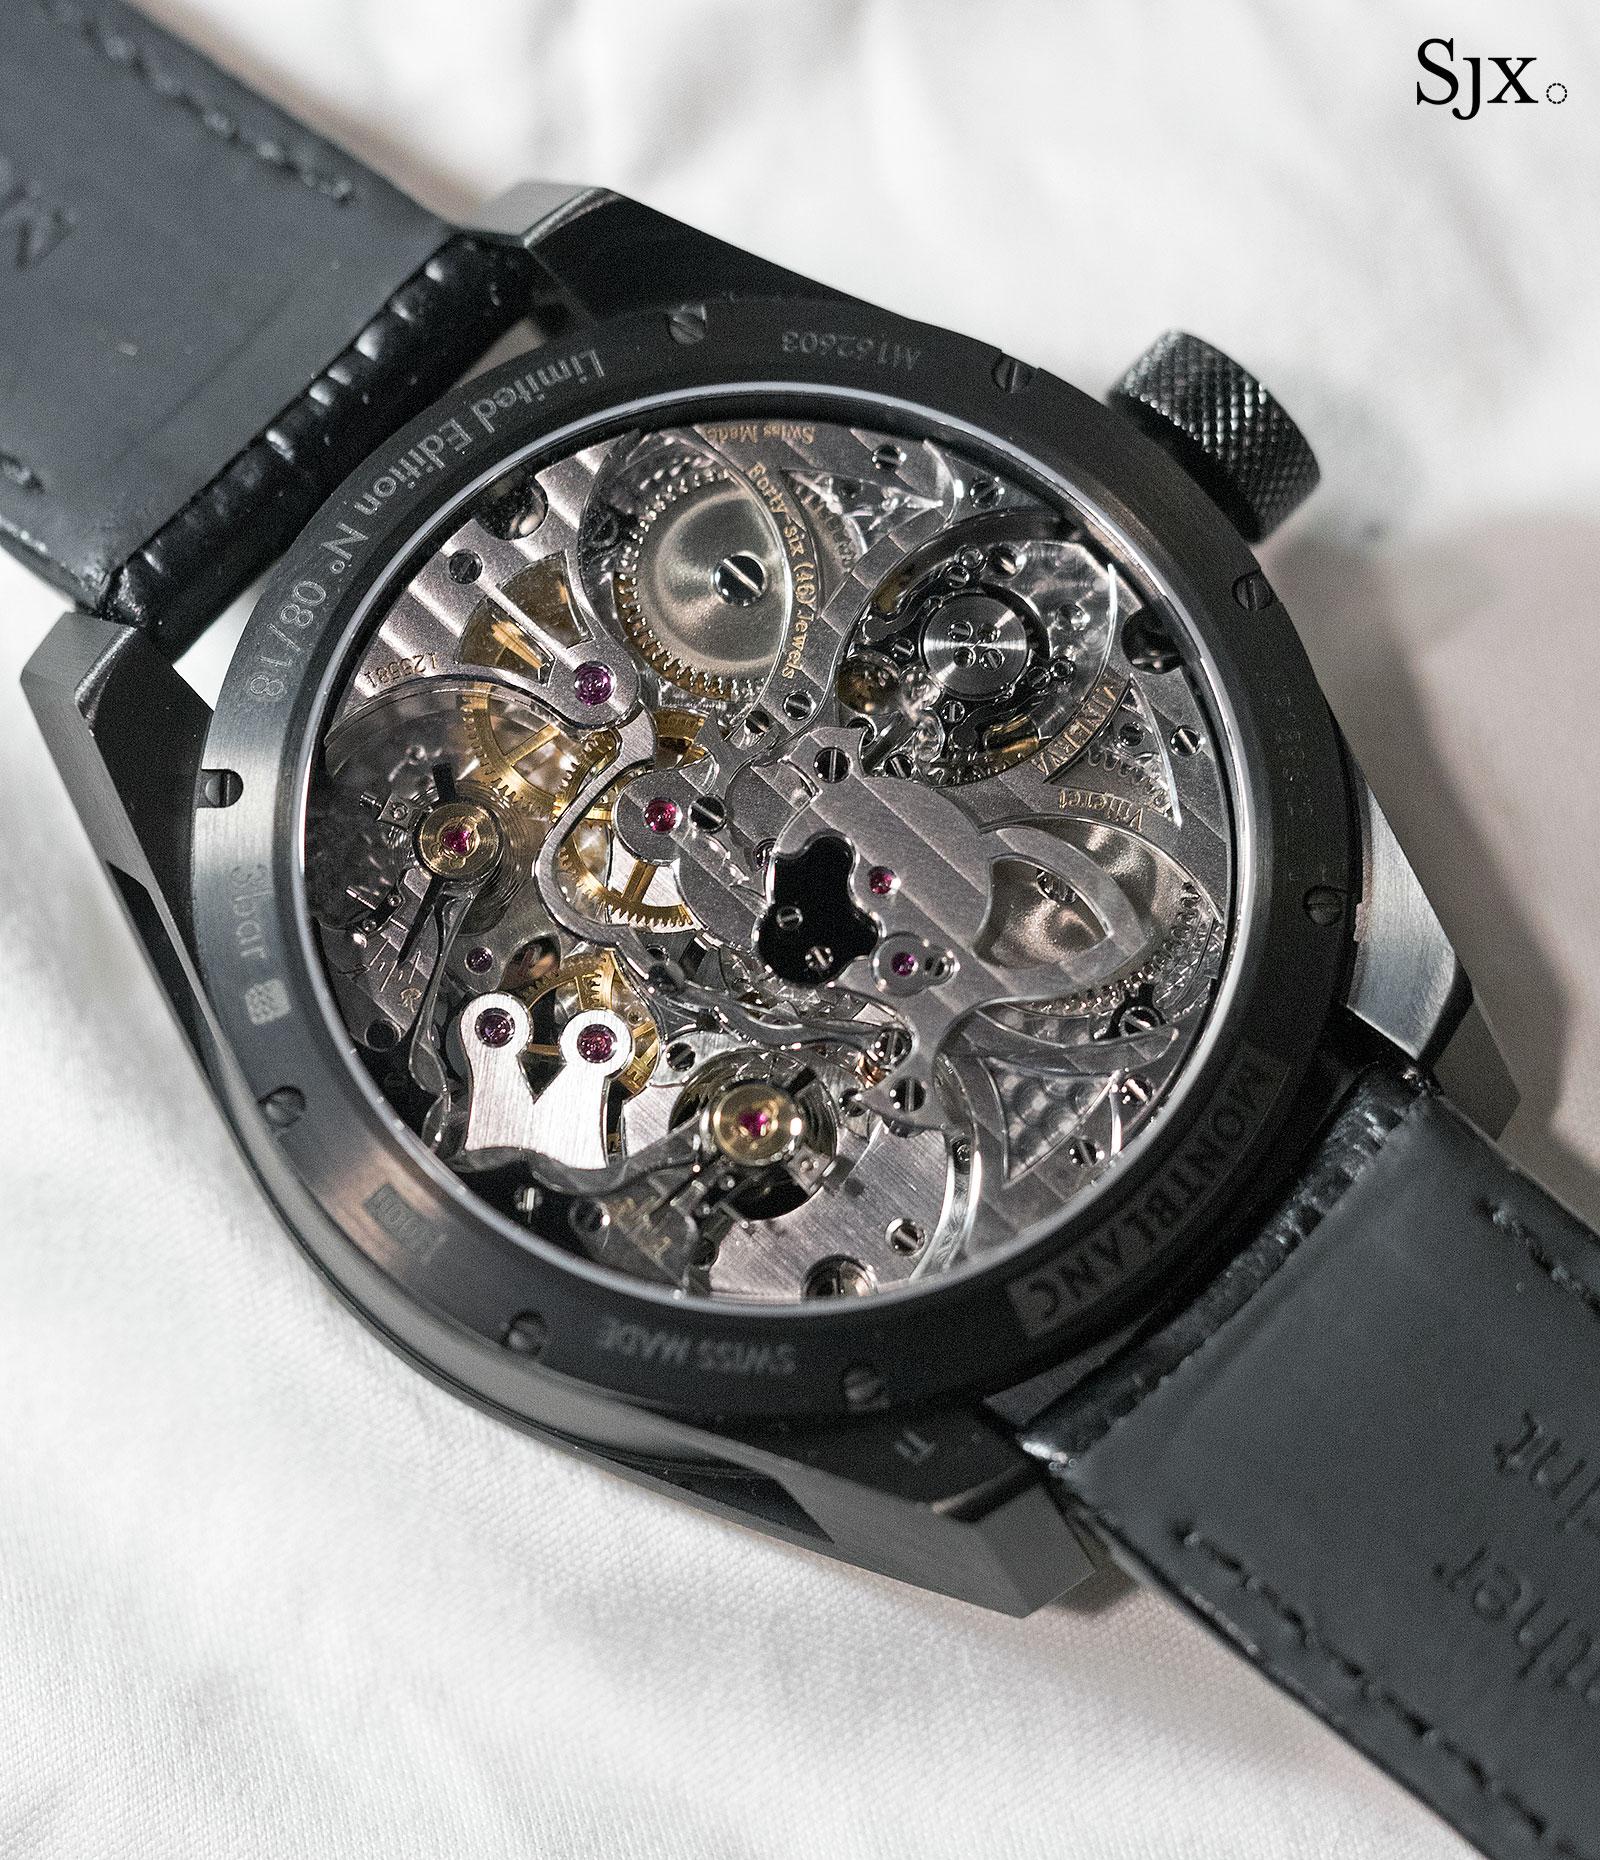 Montblanc TimeWalker Chronograph 1000 Limited Edition 18-3